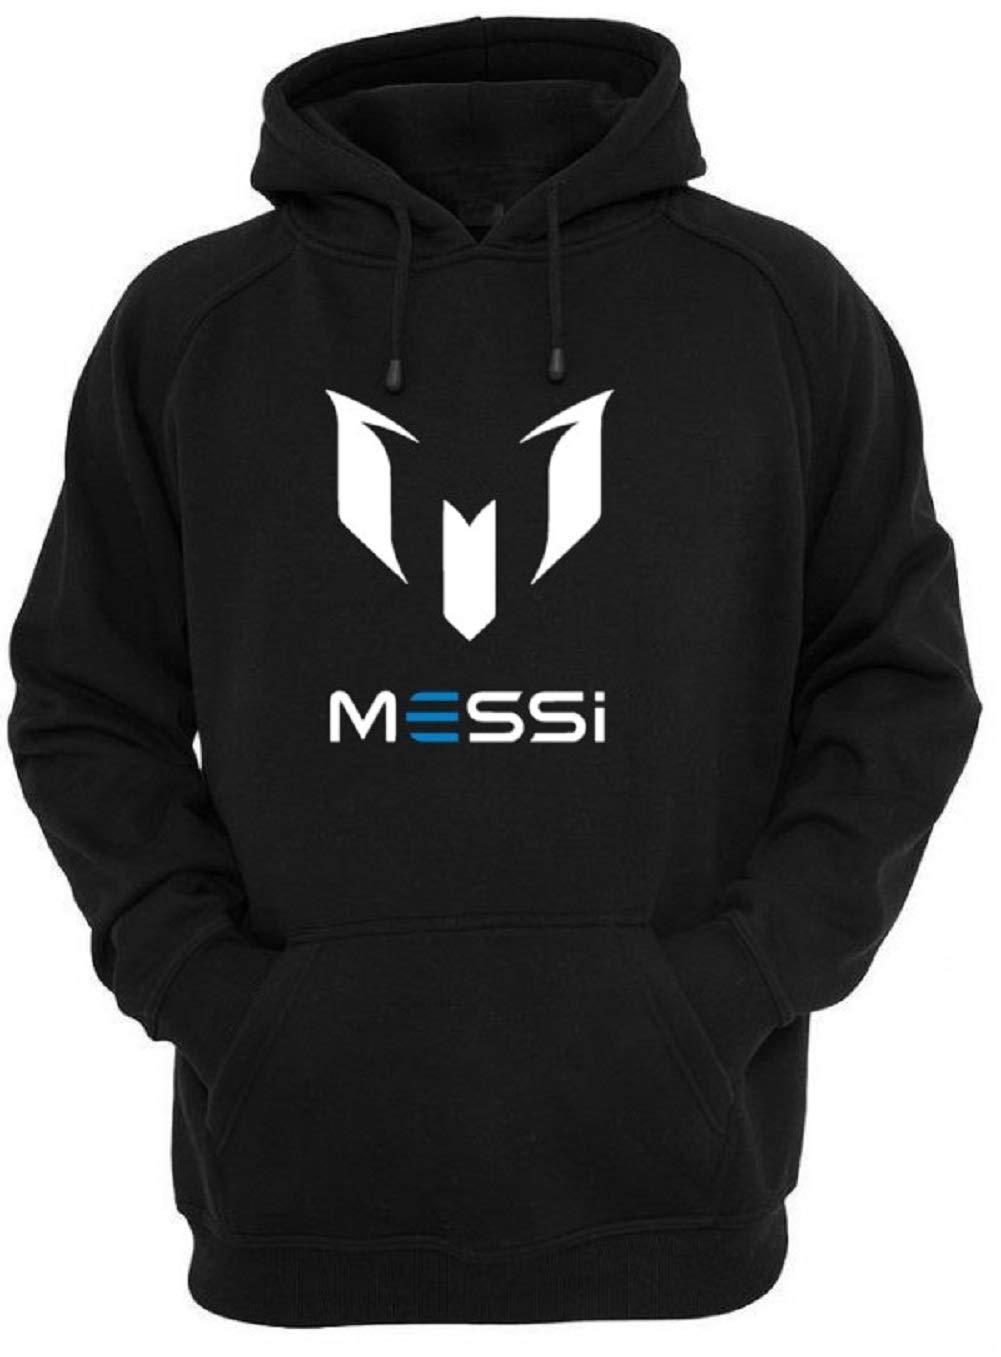 New! Lionel Messi Logo Soccer Hoodie for Boy's (YMedium-8/10) Black